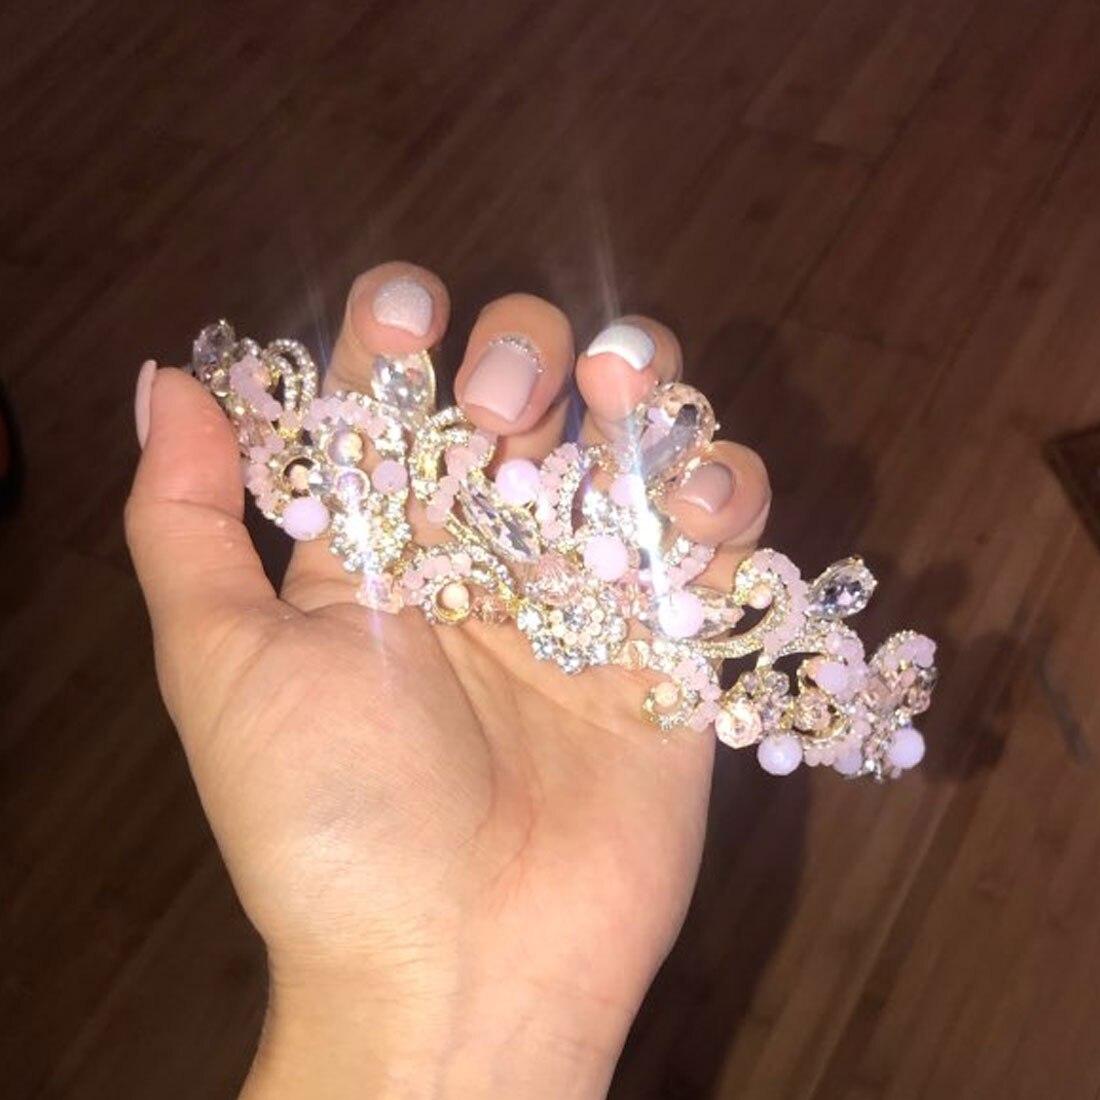 Unique 2018 New Fashion Crown Tiaras Light Gold Diadem Tiaras for Women Wedding Hair Accessories in Women 39 s Hair Accessories from Apparel Accessories